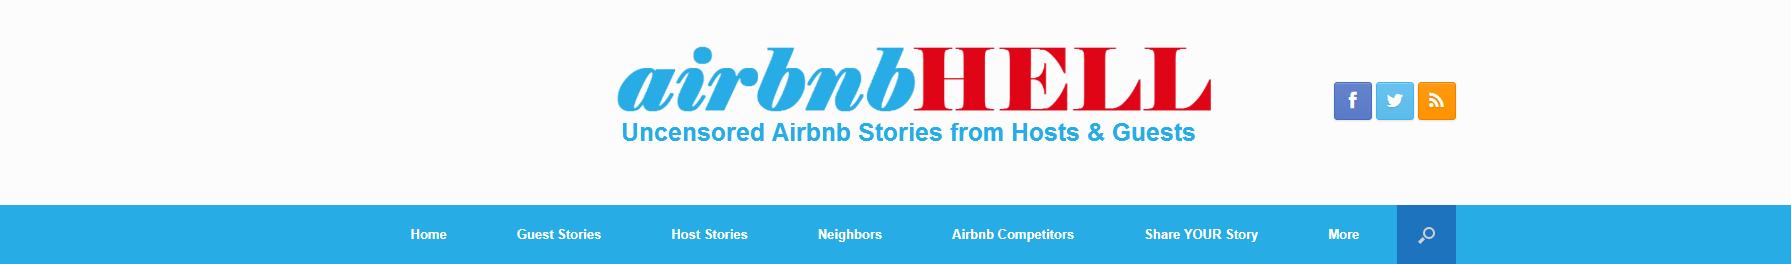 airbnb opinie negatywne